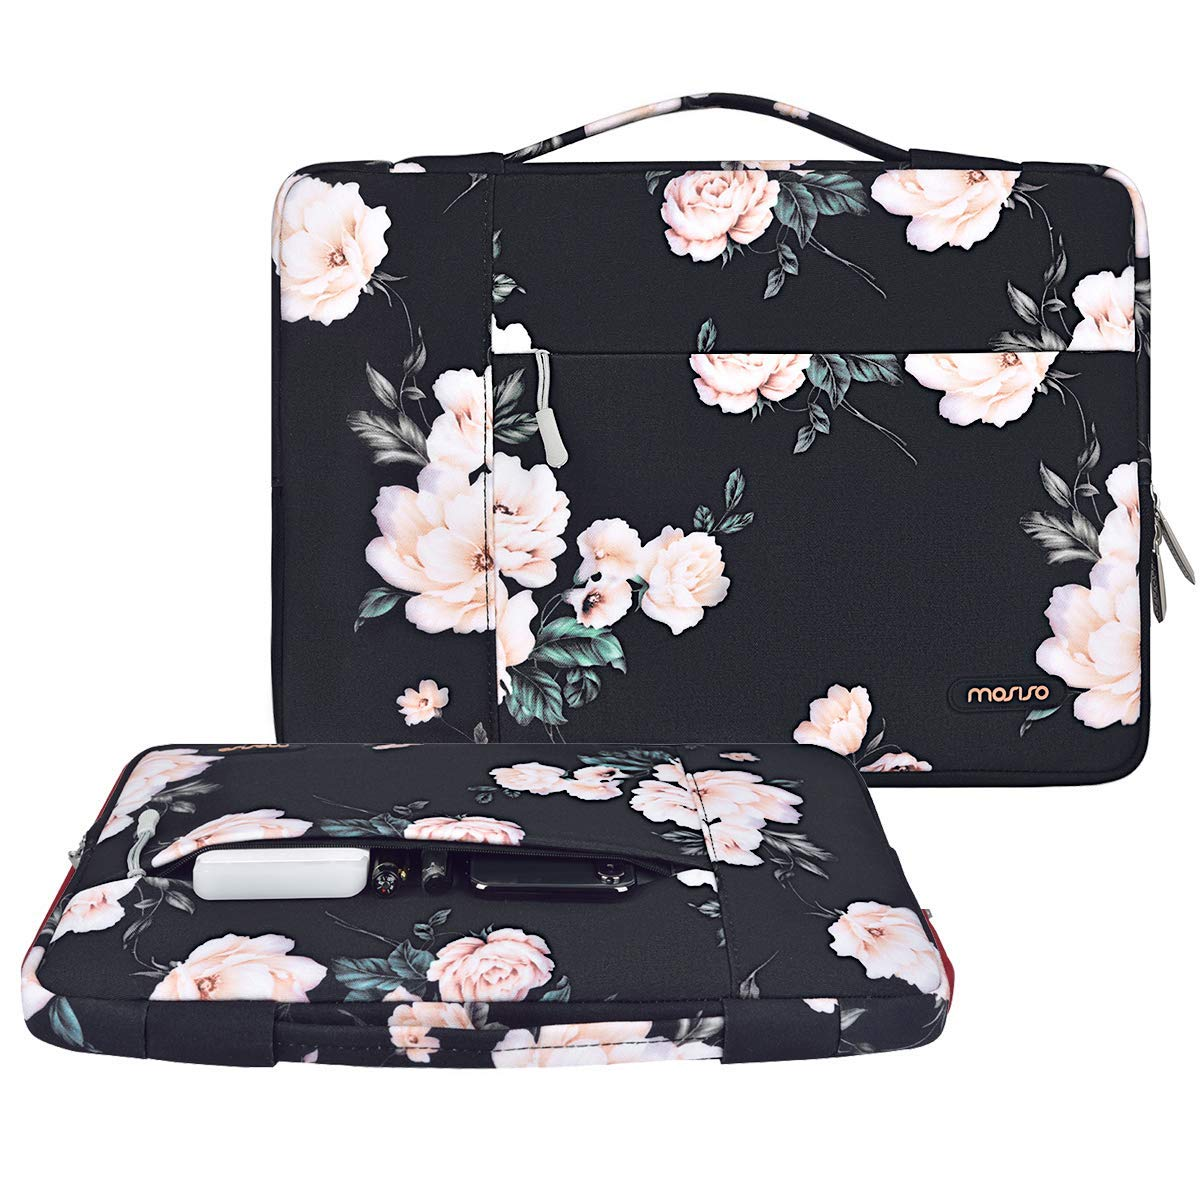 MOSISO Malet/ín Compatible 13-13.3 Pulgadas MacBook Pro Retina//MacBook Air//Surface Laptop 2 2018 2017//Surface Book 2//1 Azul Marino Poli/éster Protectora Multifuncional Funda Bolso